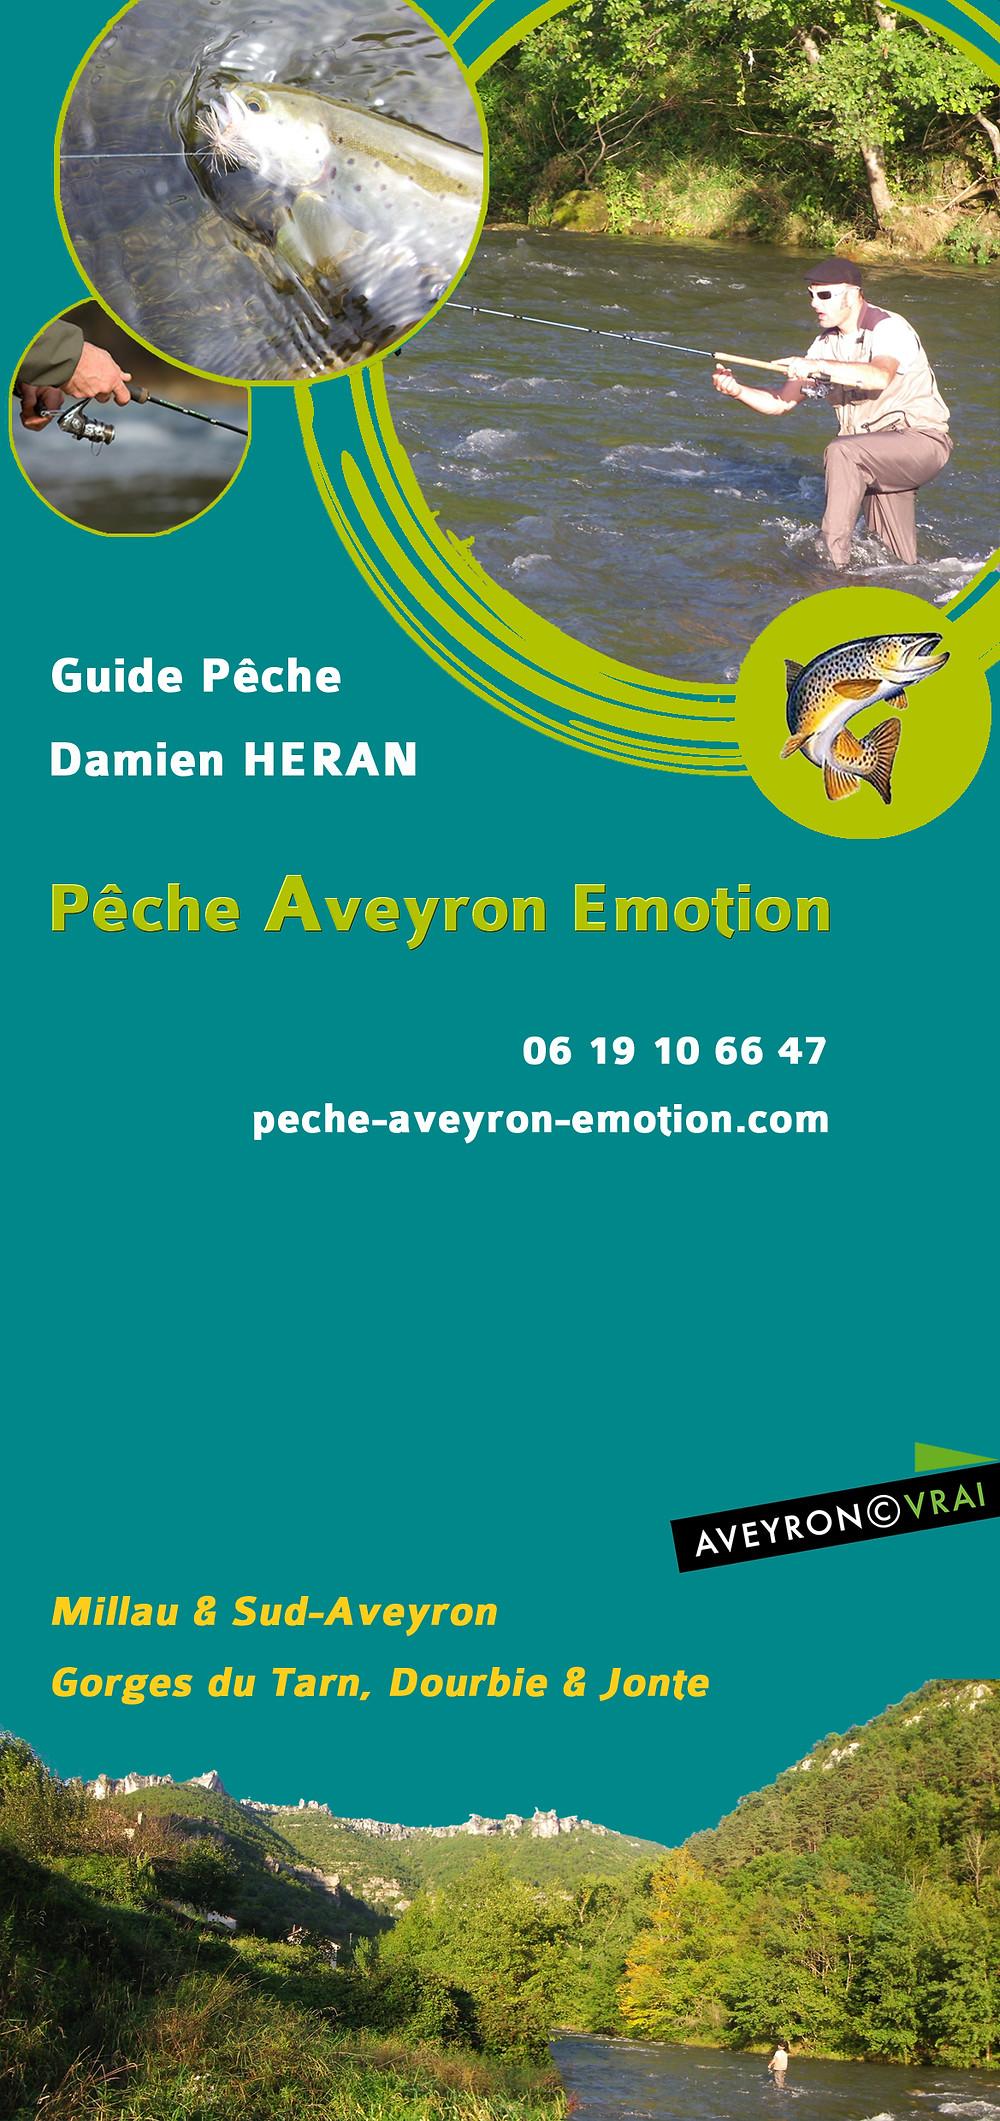 Pêche Aveyron Emotion - Guide Pêche - Damien Heran - Aveyron